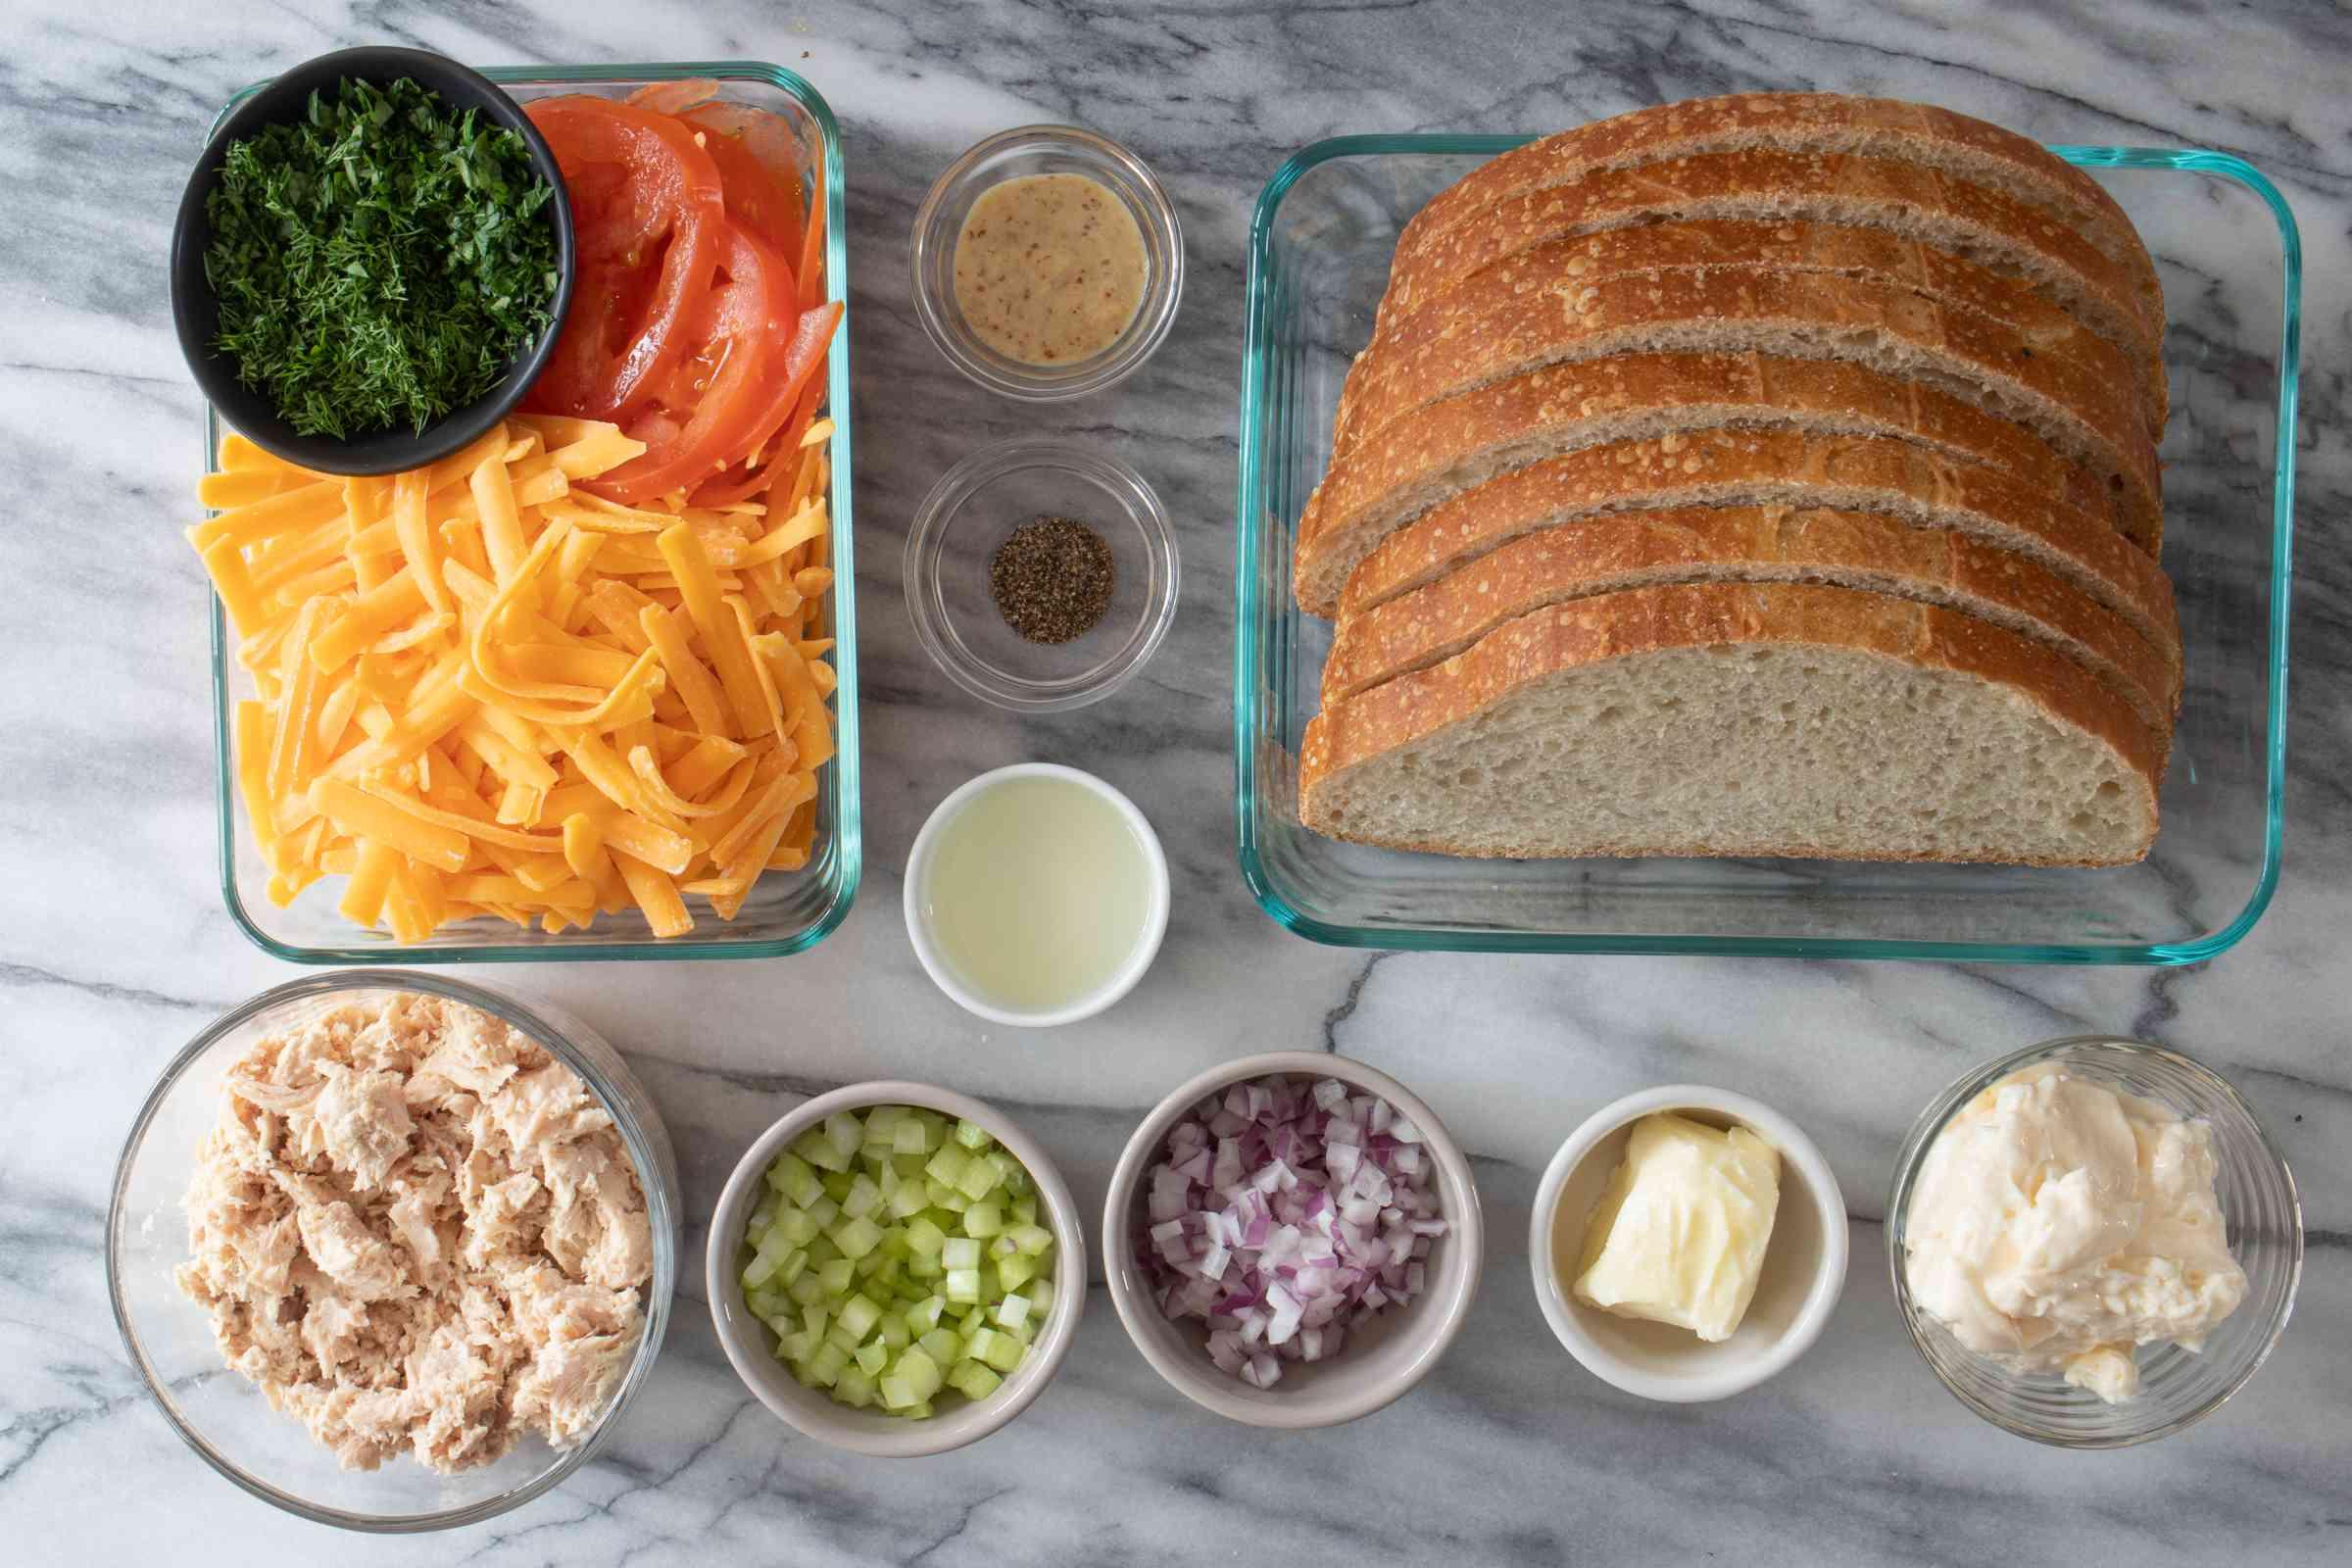 ingredients for tuna melt sandwiches